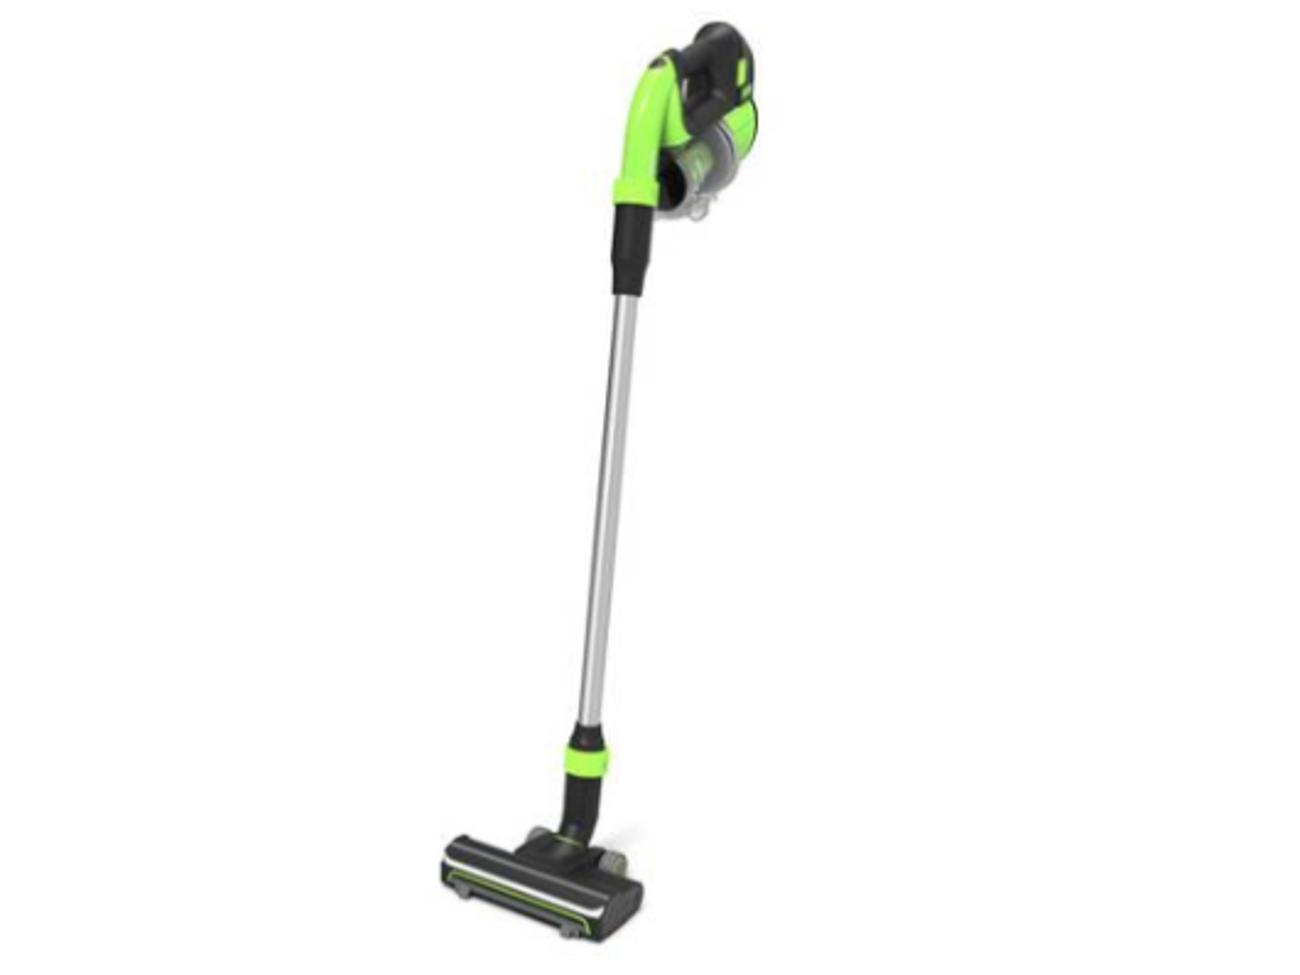 gtech multipower cordless floor vacuum cleaner